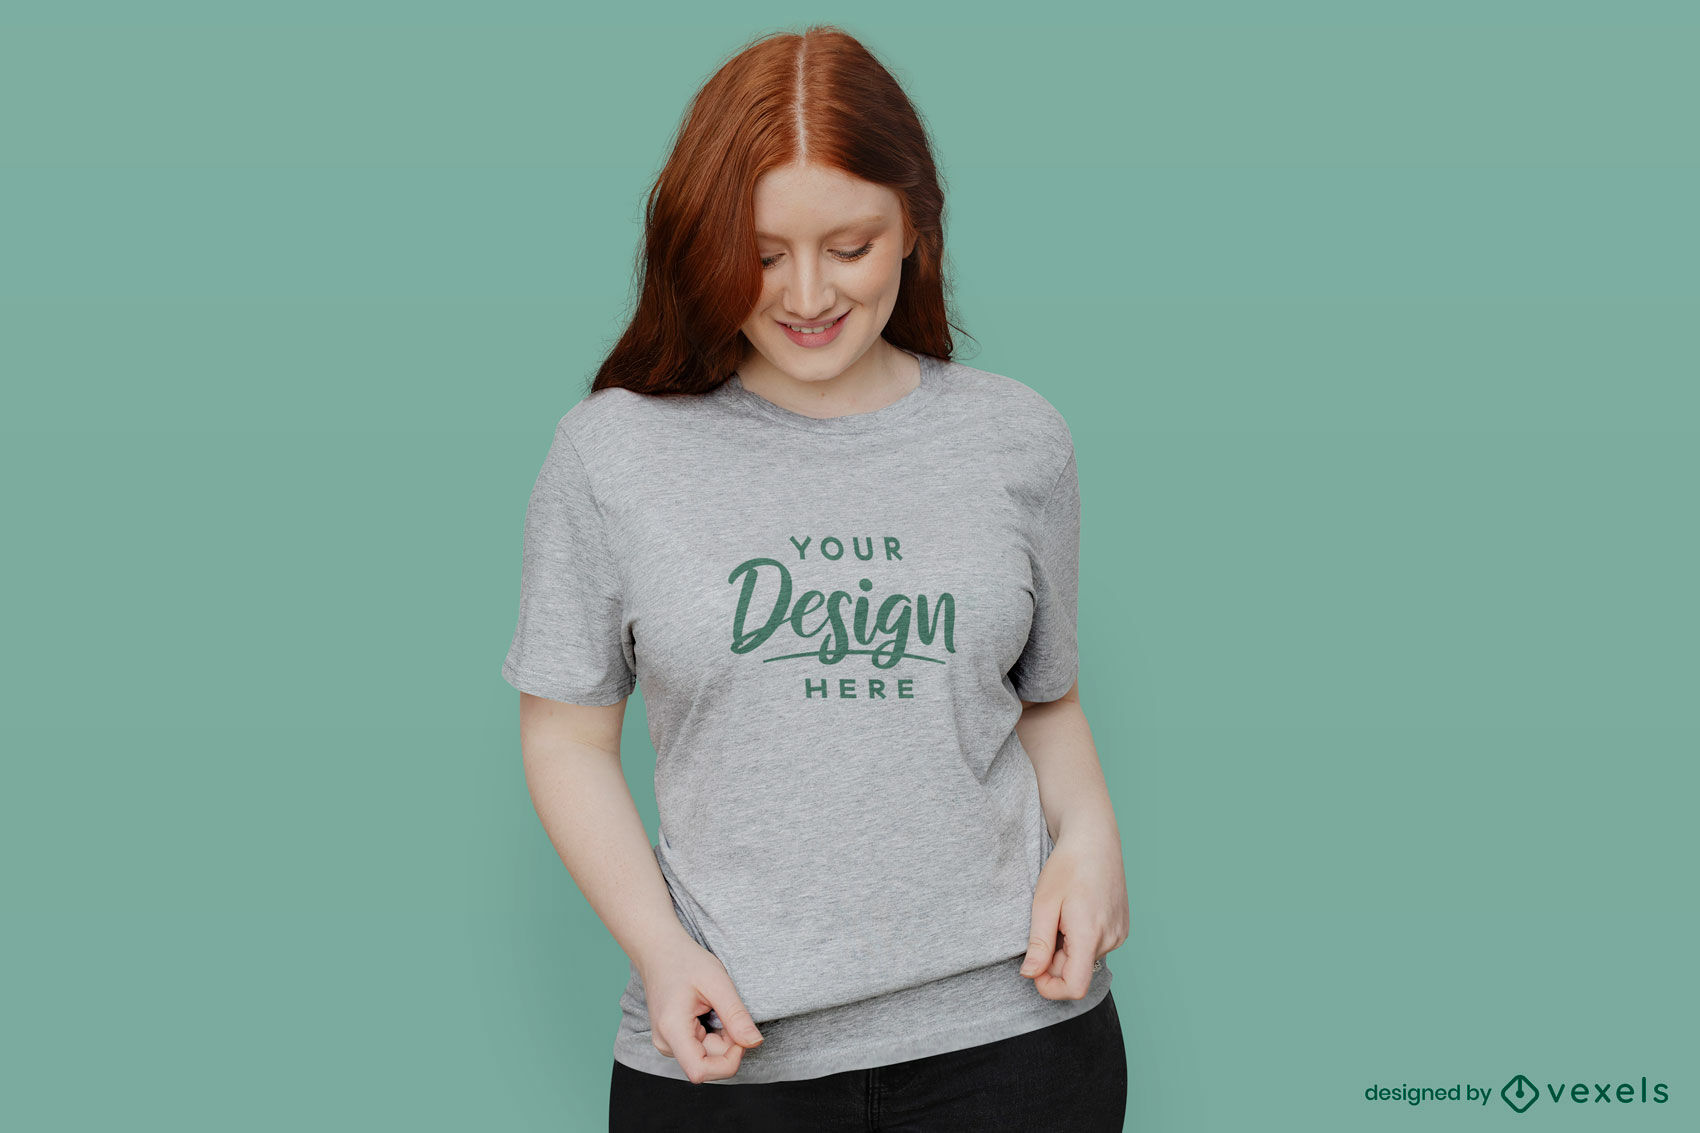 Chica en camiseta gris maqueta de fondo verde